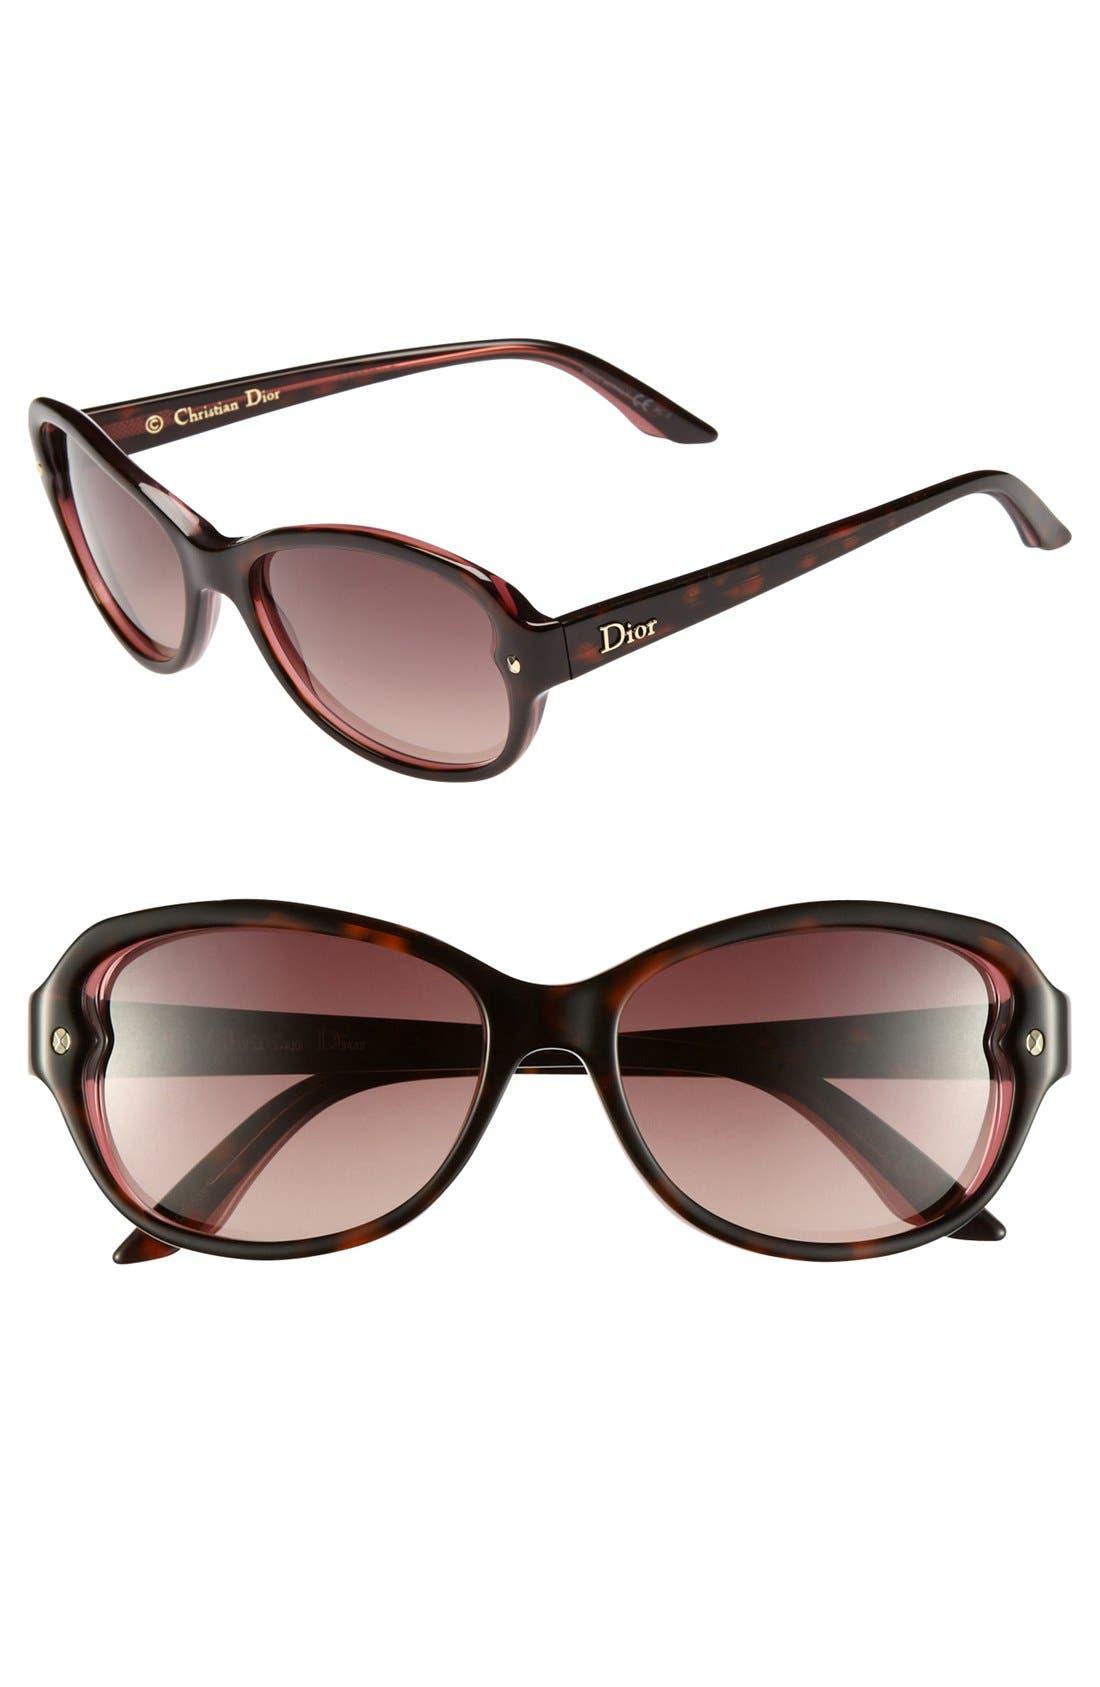 Main Image - Christian Dior 'Pondicherry 2/S' 53mm Sunglasses